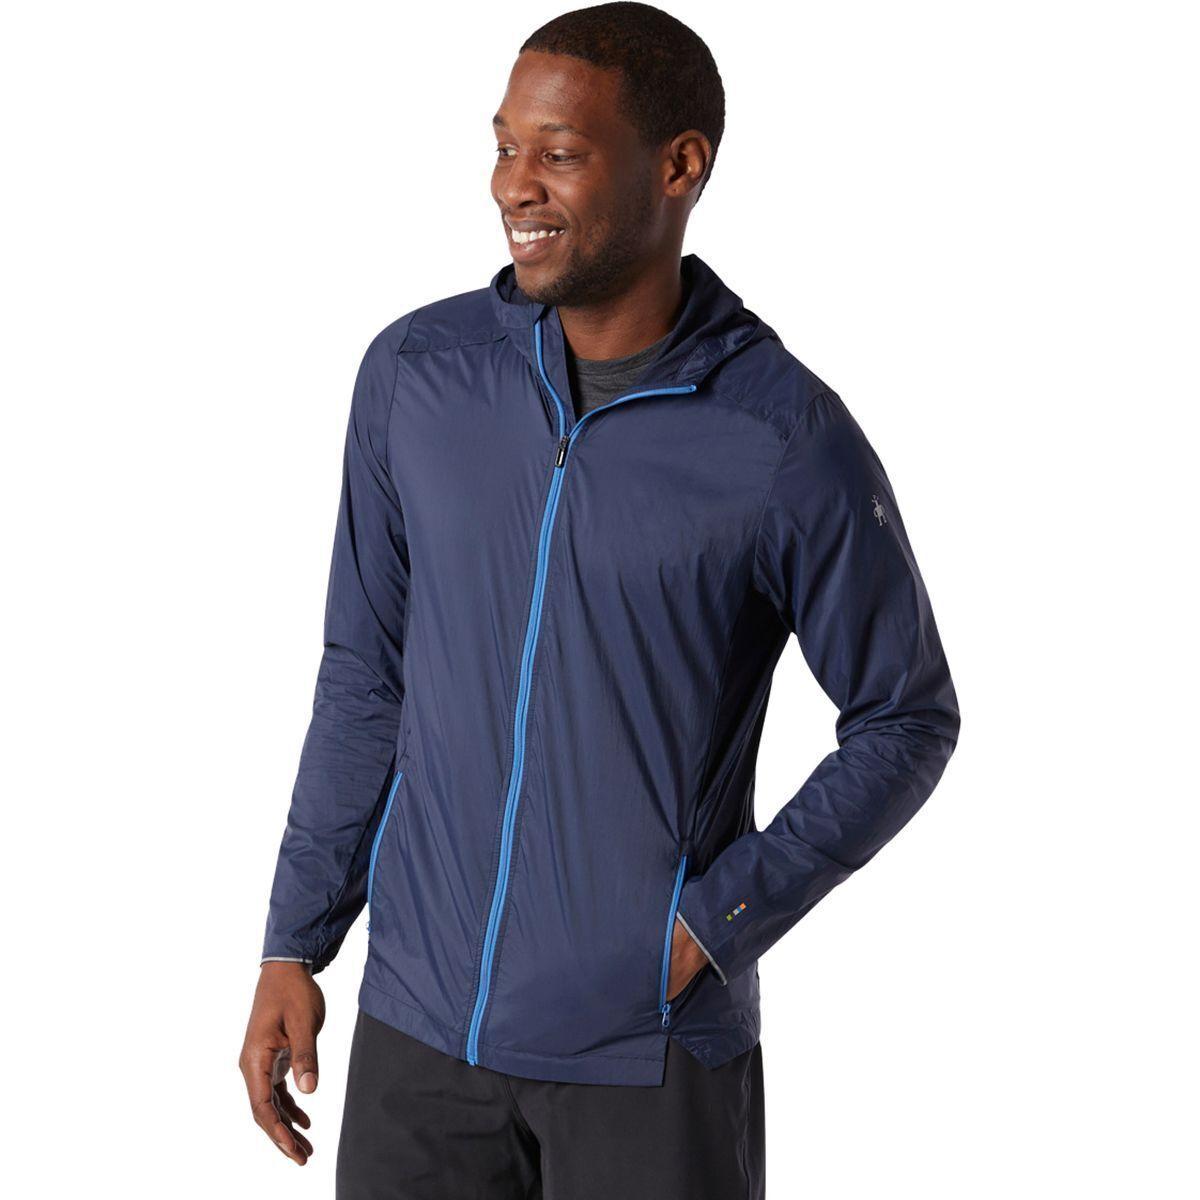 Merino Sport Ultra Light Hooded Jacket Men S Light Hooded Jacket Hooded Jacket Men Hooded Jacket